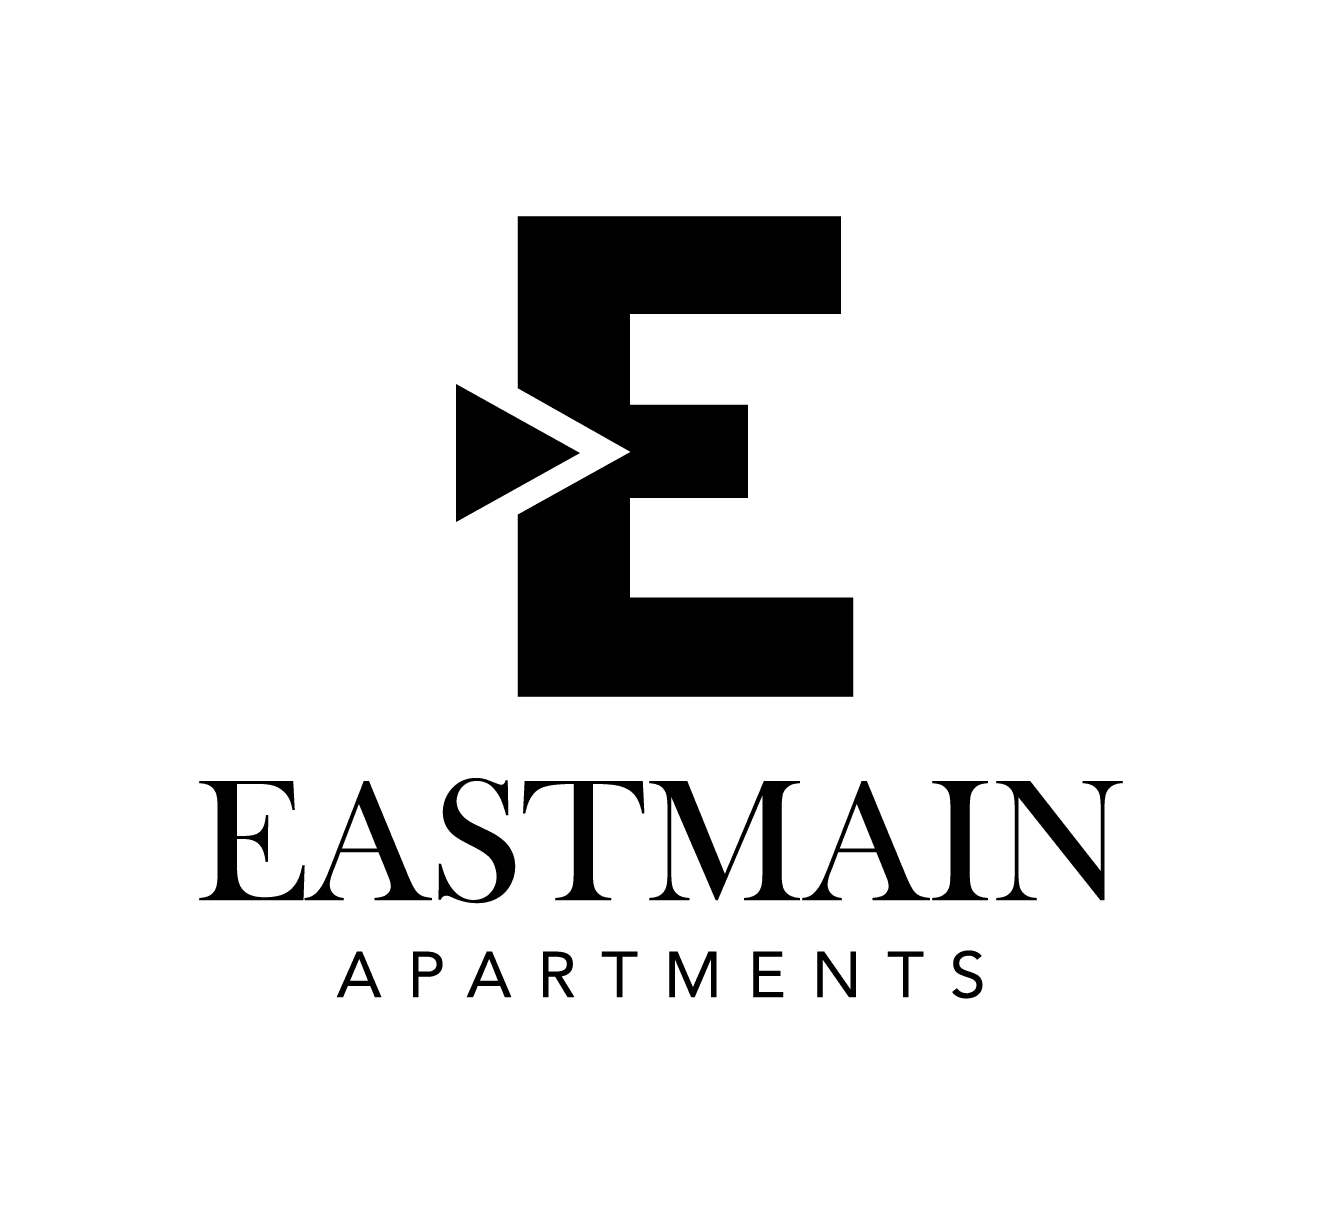 East Main